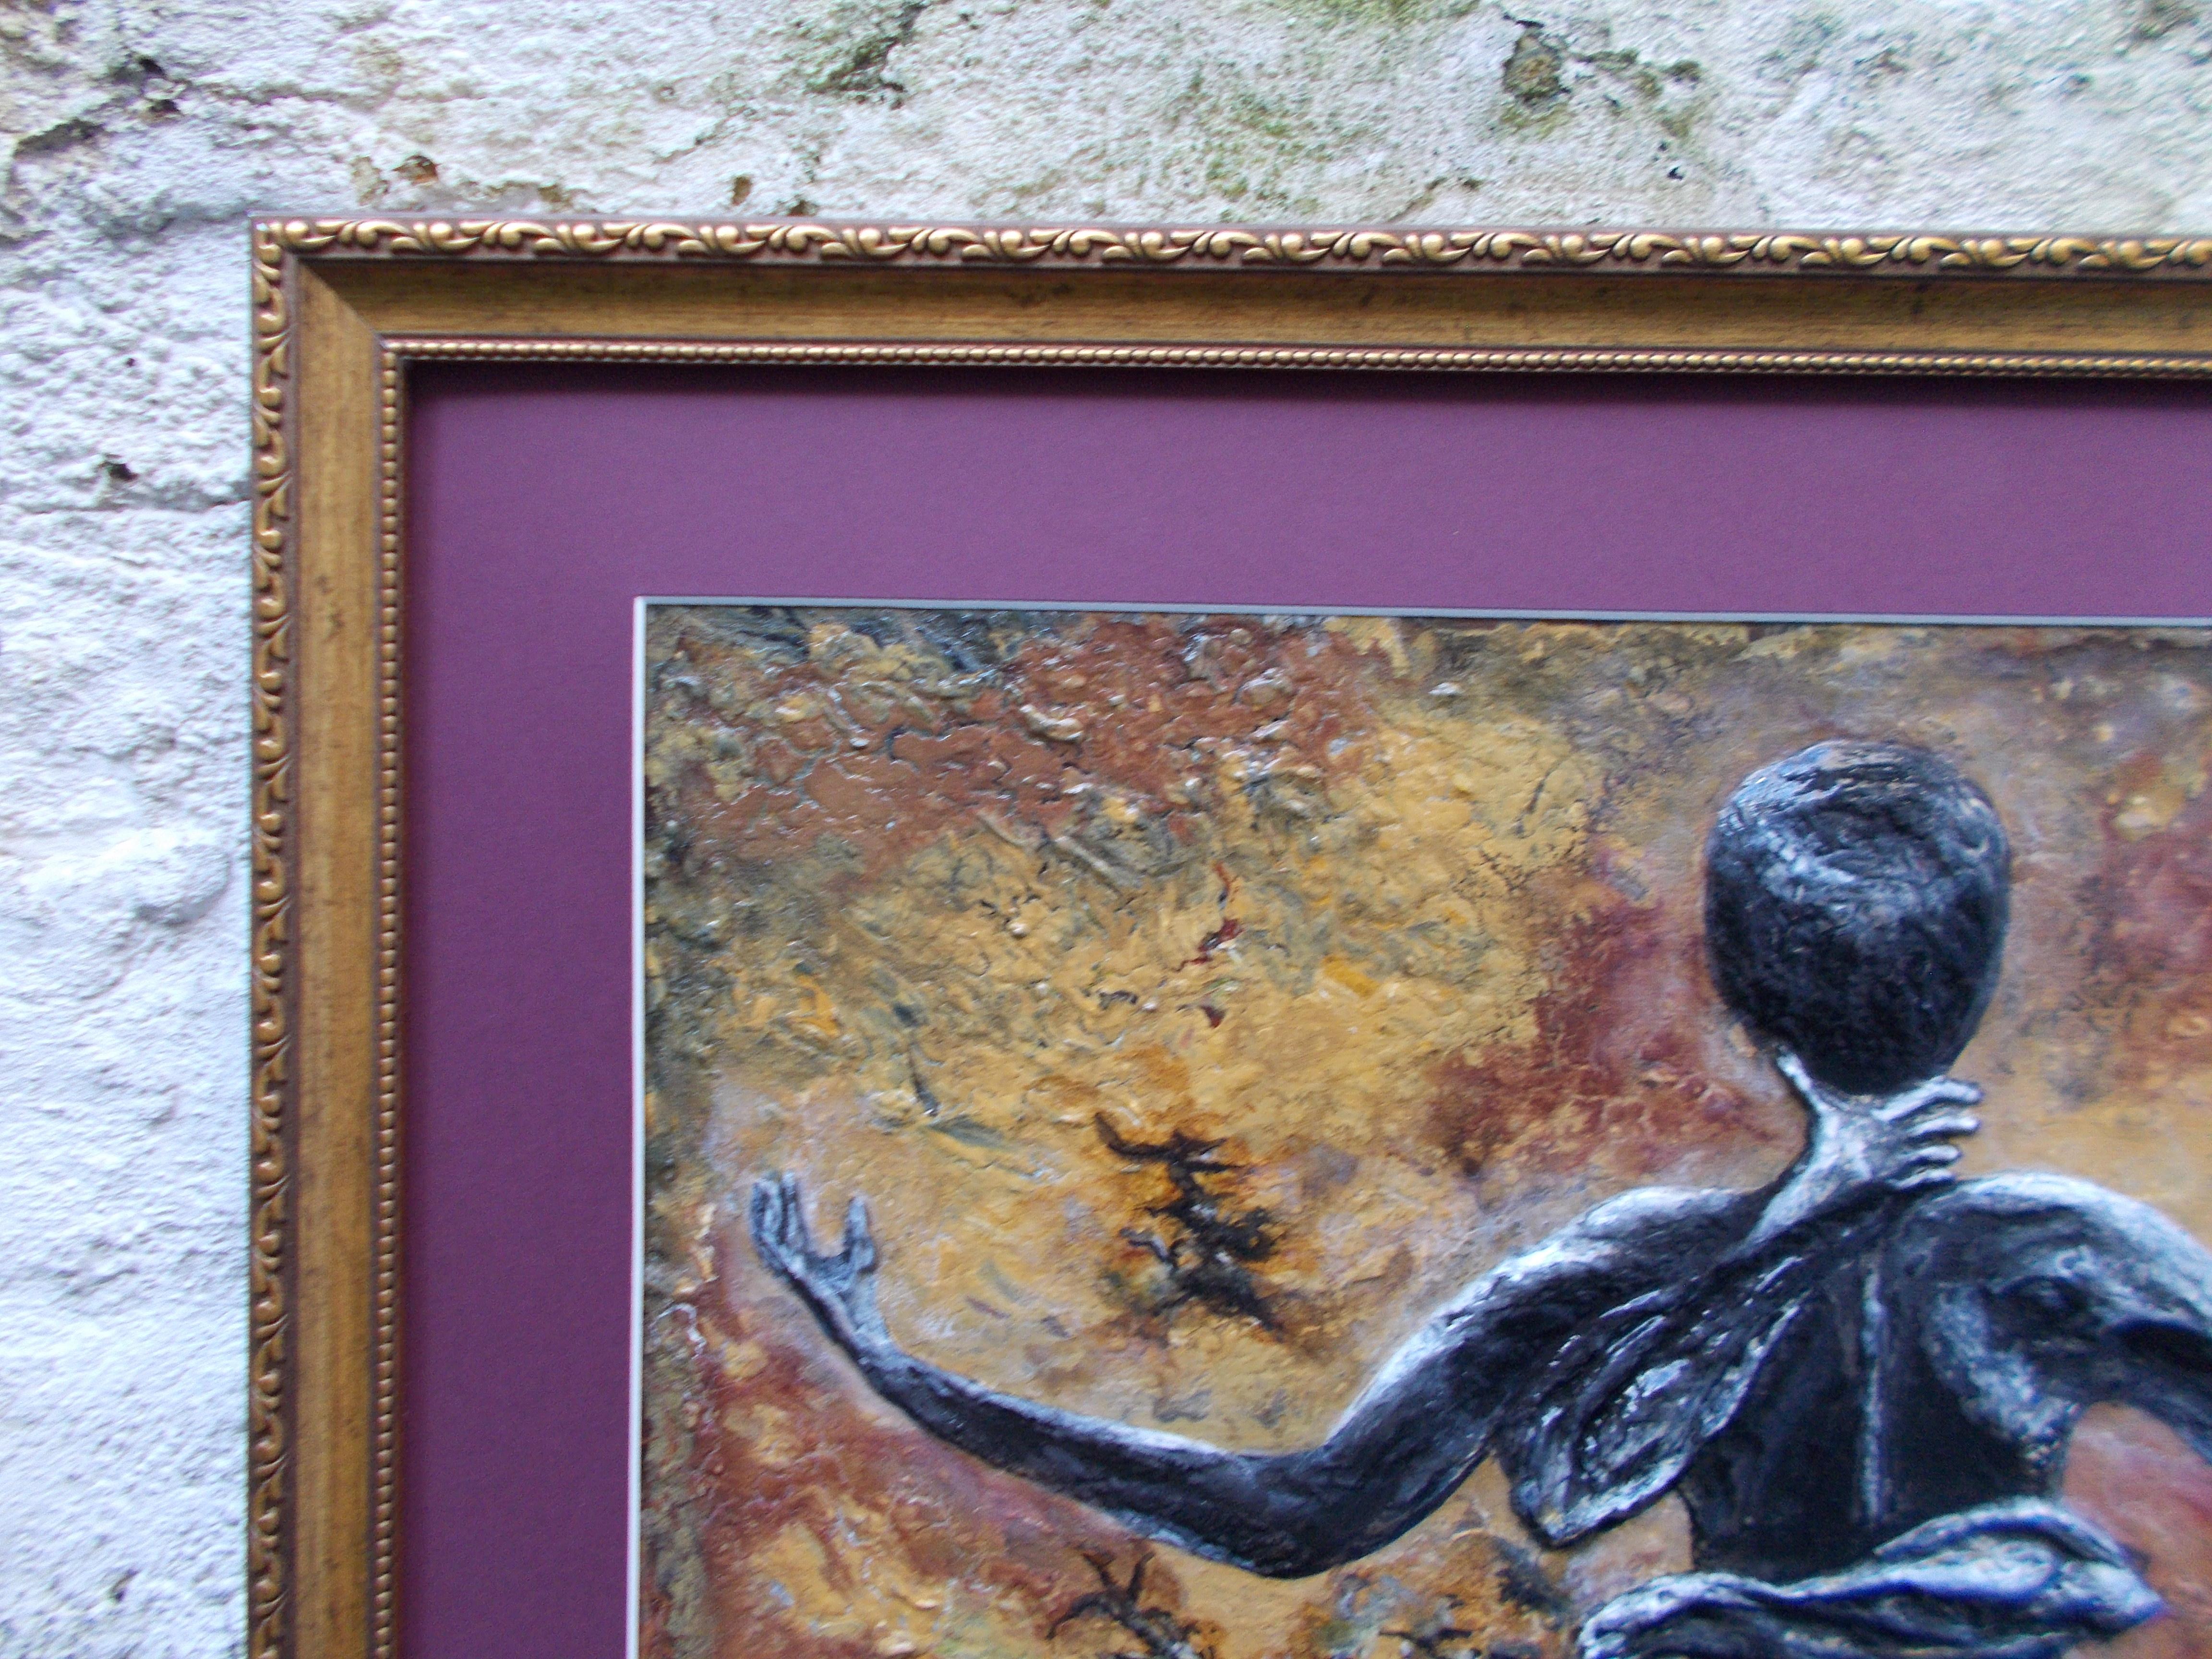 Scorpio-The-Scorpion-Oct 23-Nov 21-Jurita-2019-Painting Relief 3D-mixed-media-acrylic-clay-40x50cm© (14)